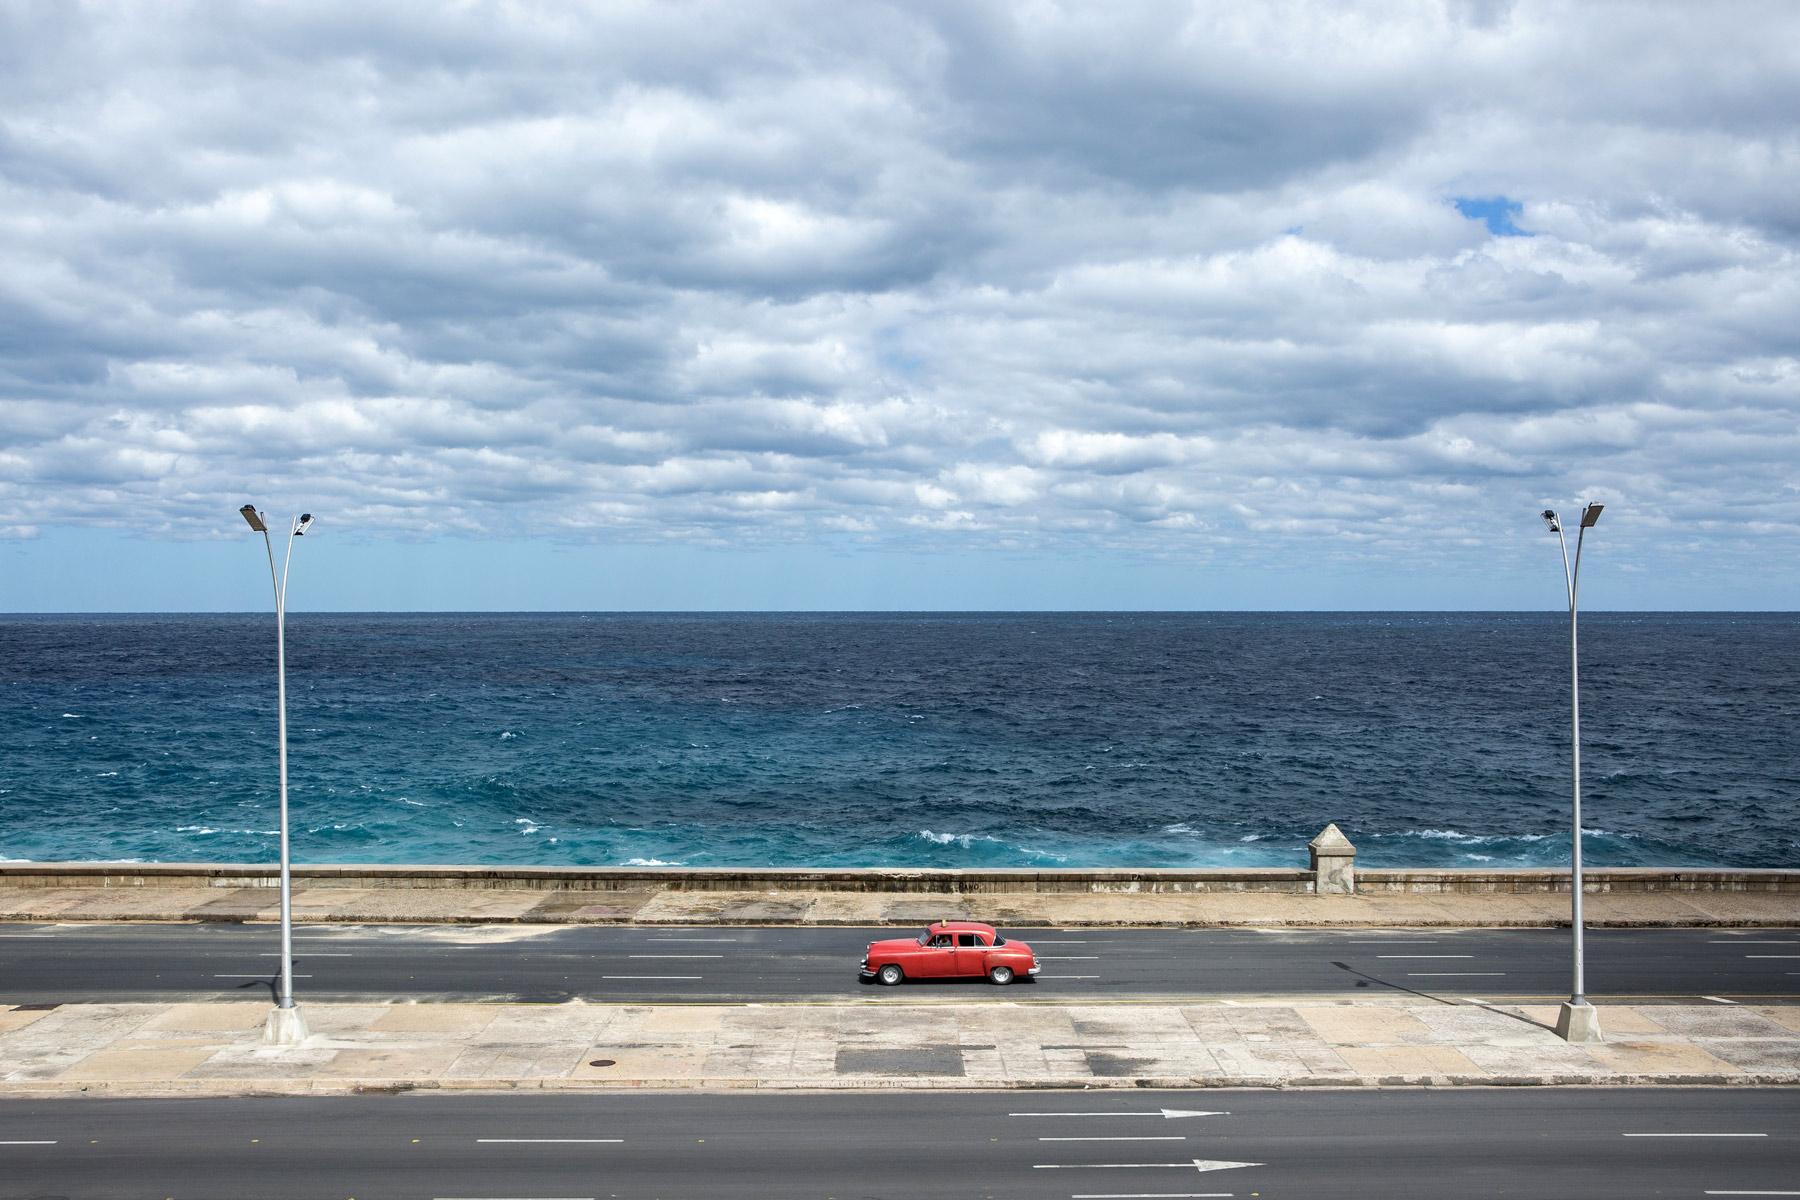 A classic American car driving along the Malecon in Havana, Cuba